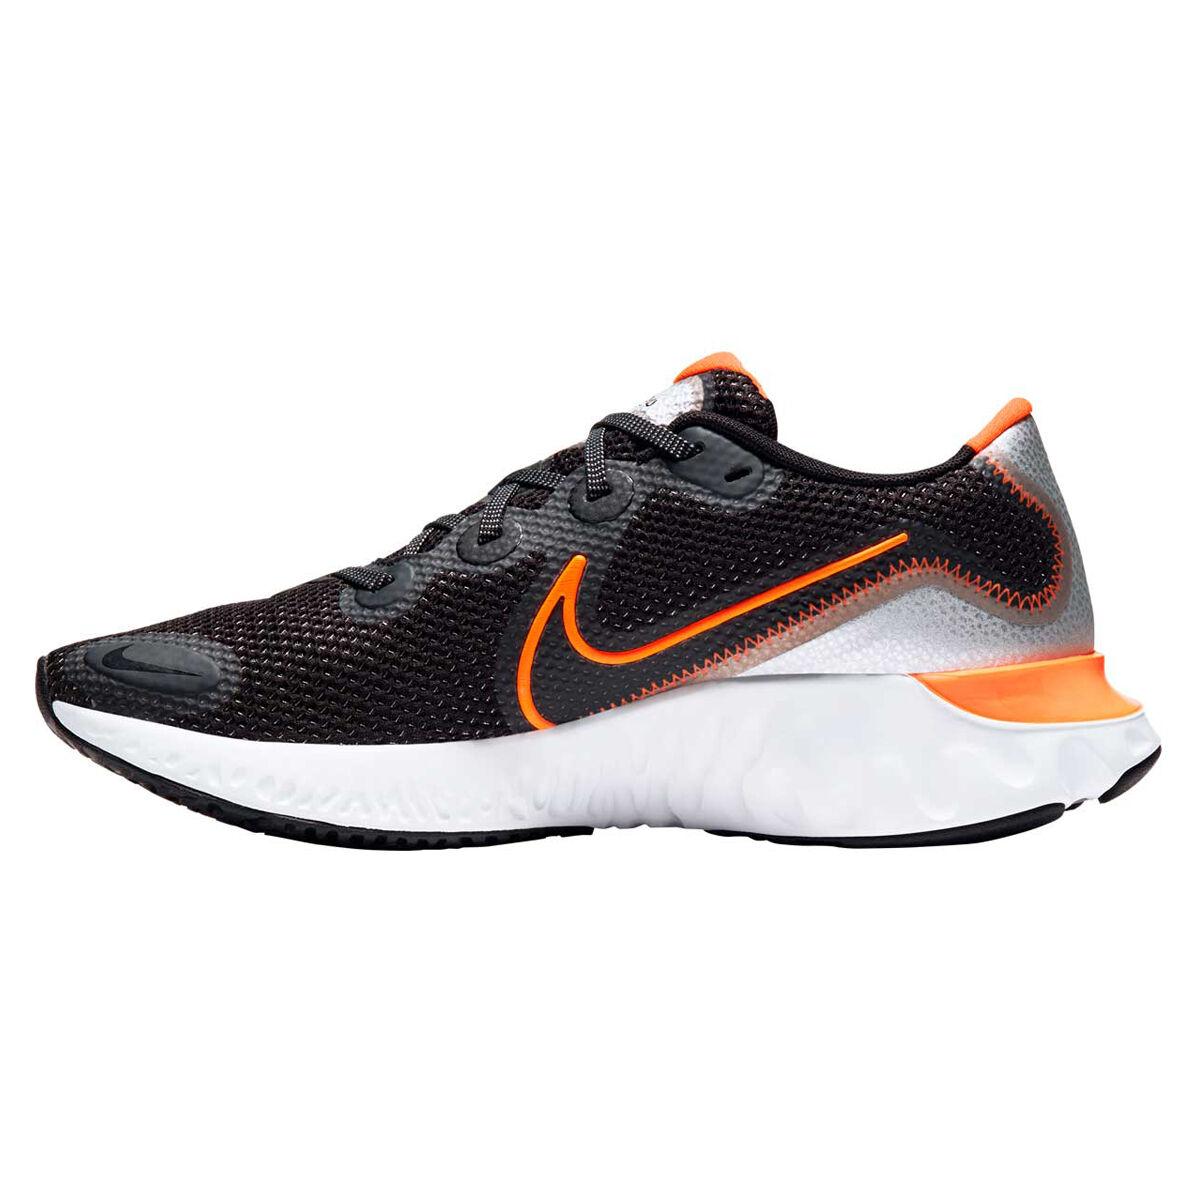 Nike Renew Run Mens Running Shoes | Rebel Sport